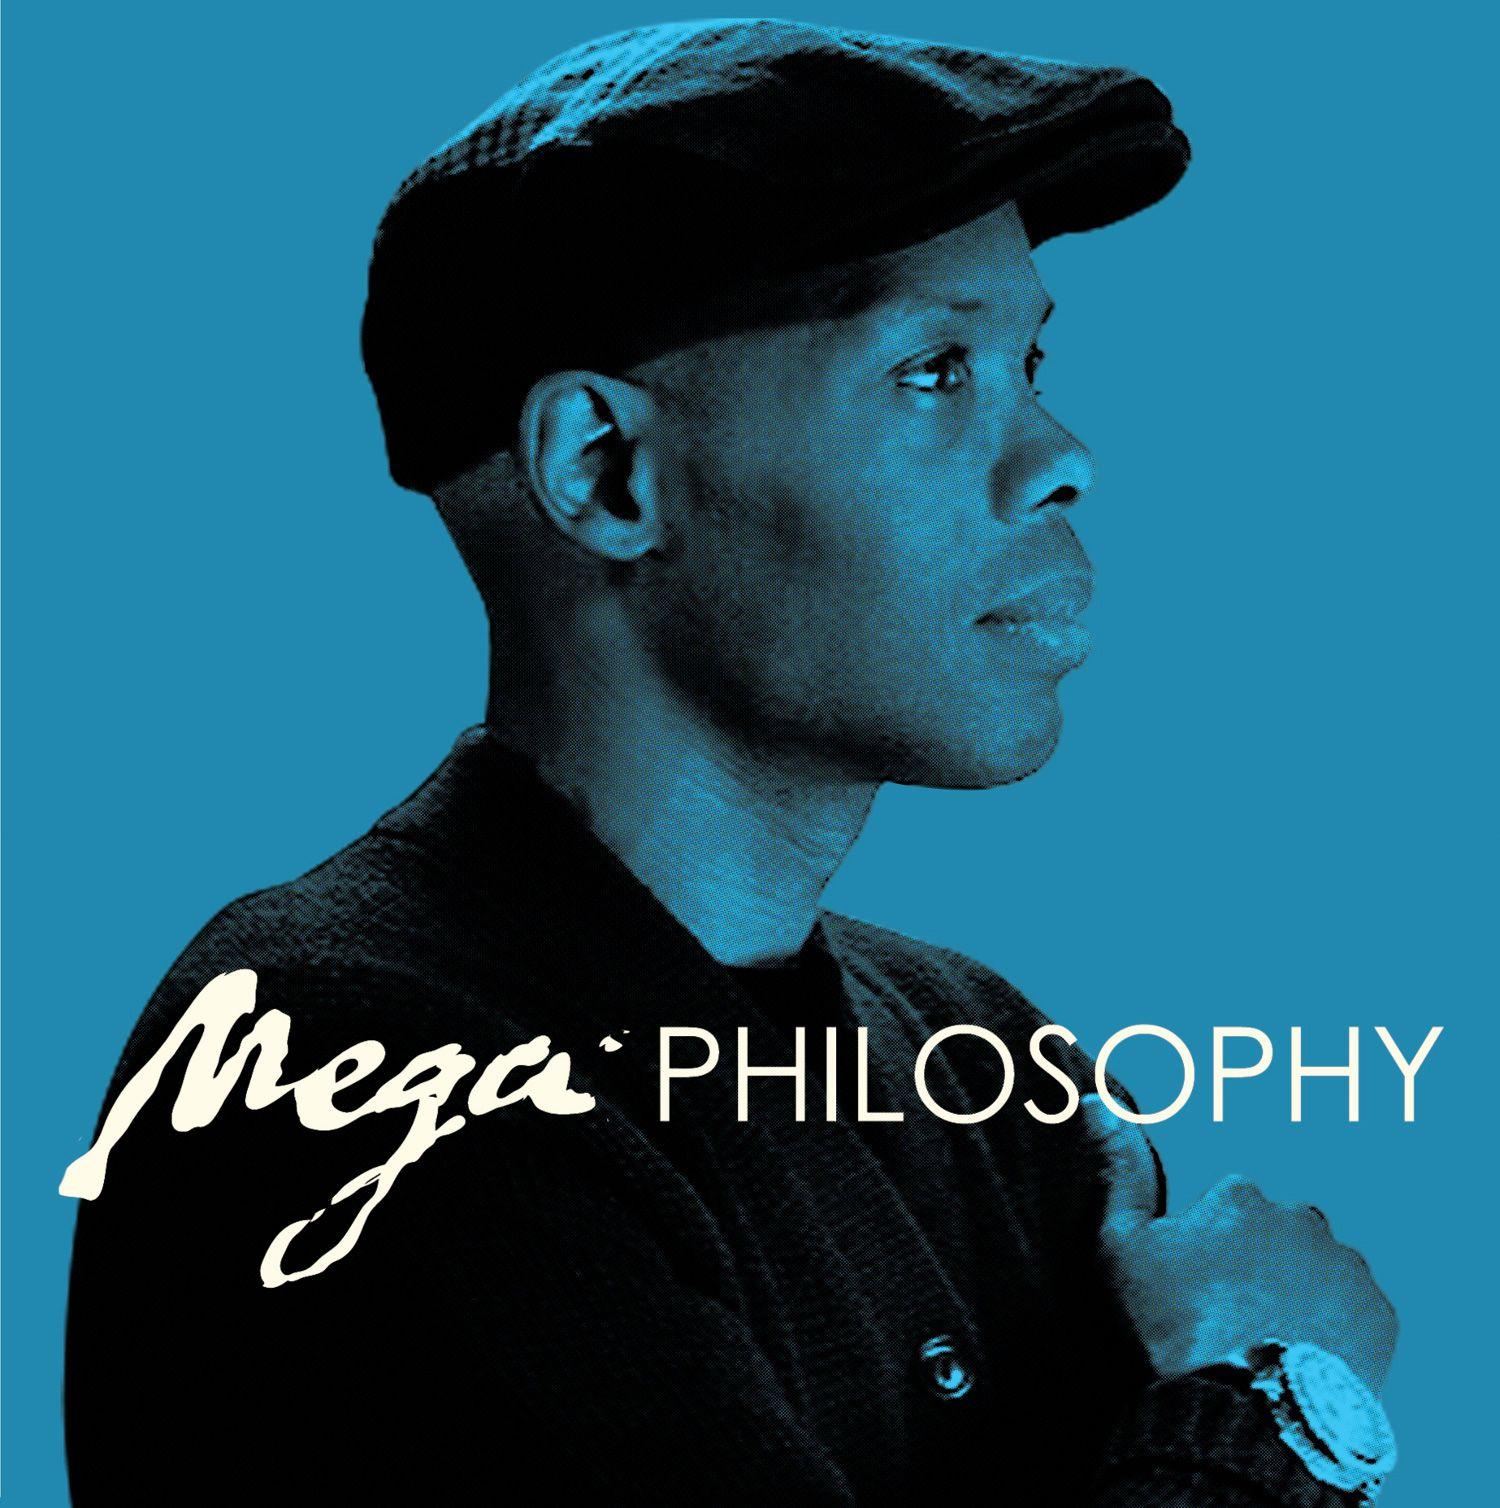 Cormega - 'Mega Philosophy' (CD)